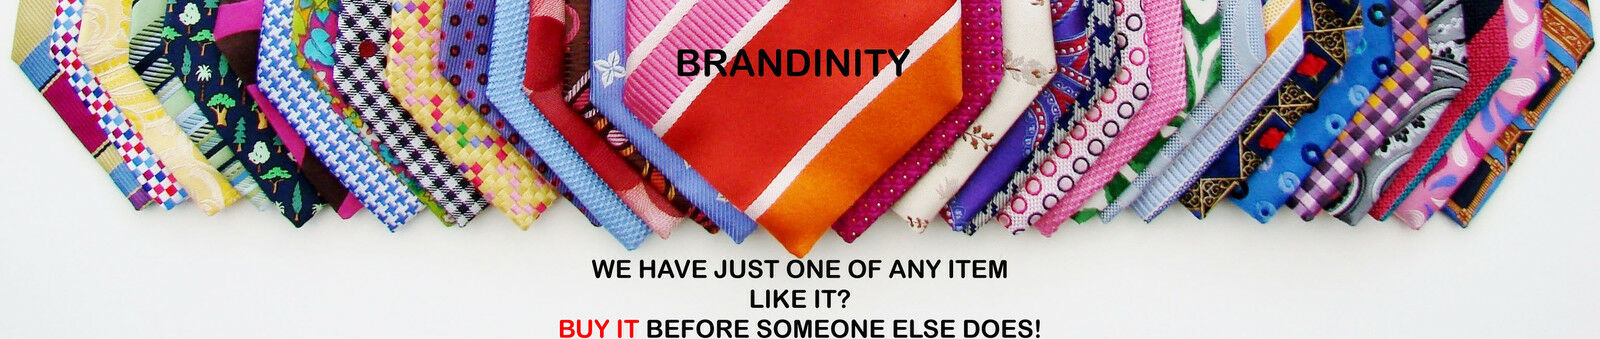 BRANDINITY